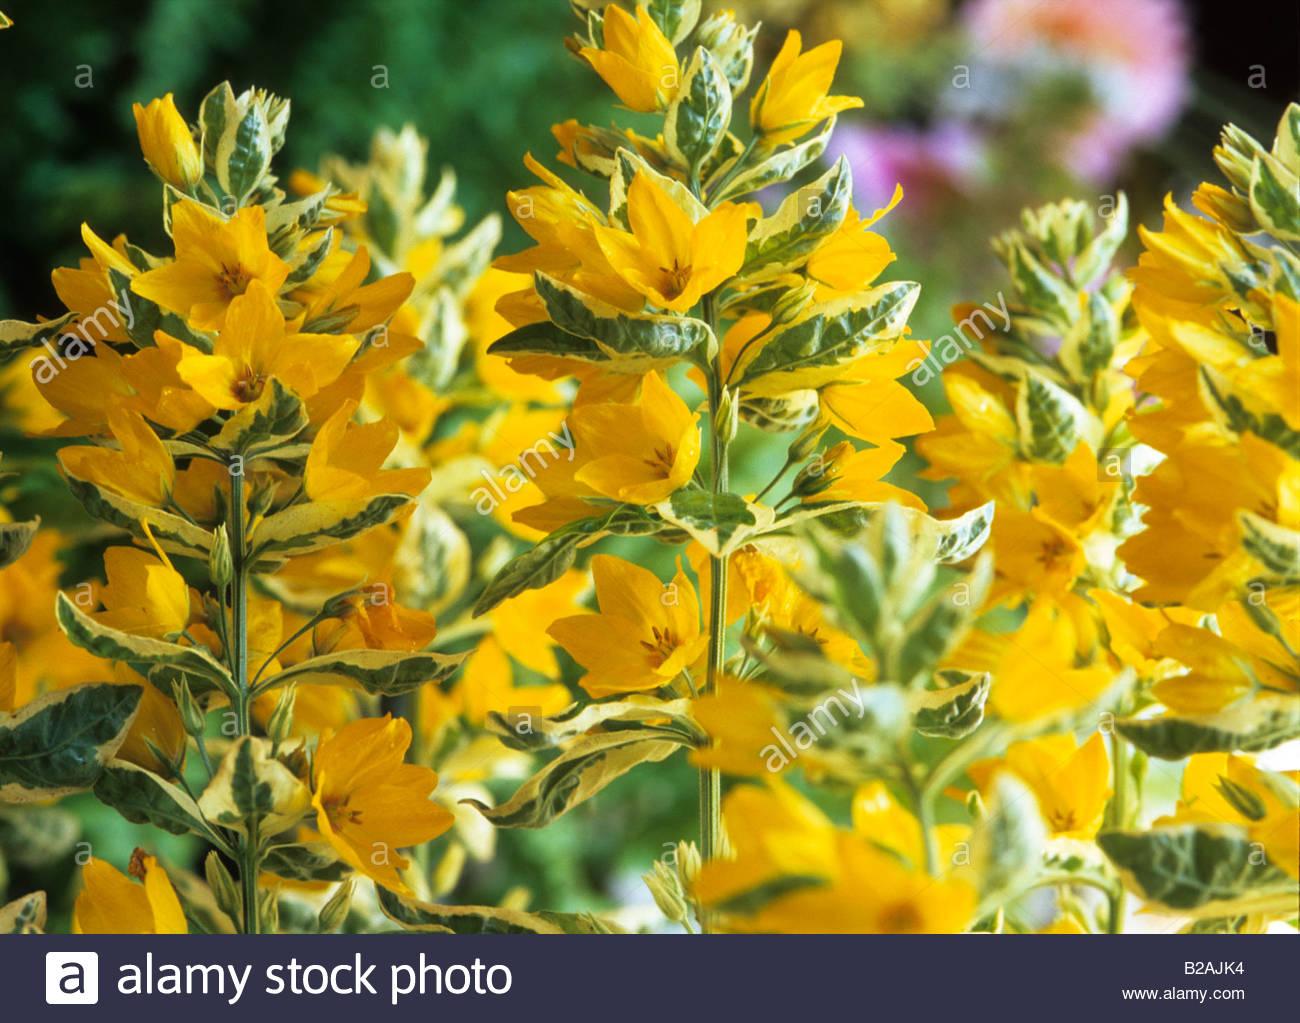 Yellow loosestrife lysimachia punctata alexander summer flower stock yellow loosestrife lysimachia punctata alexander summer flower perennial mightylinksfo